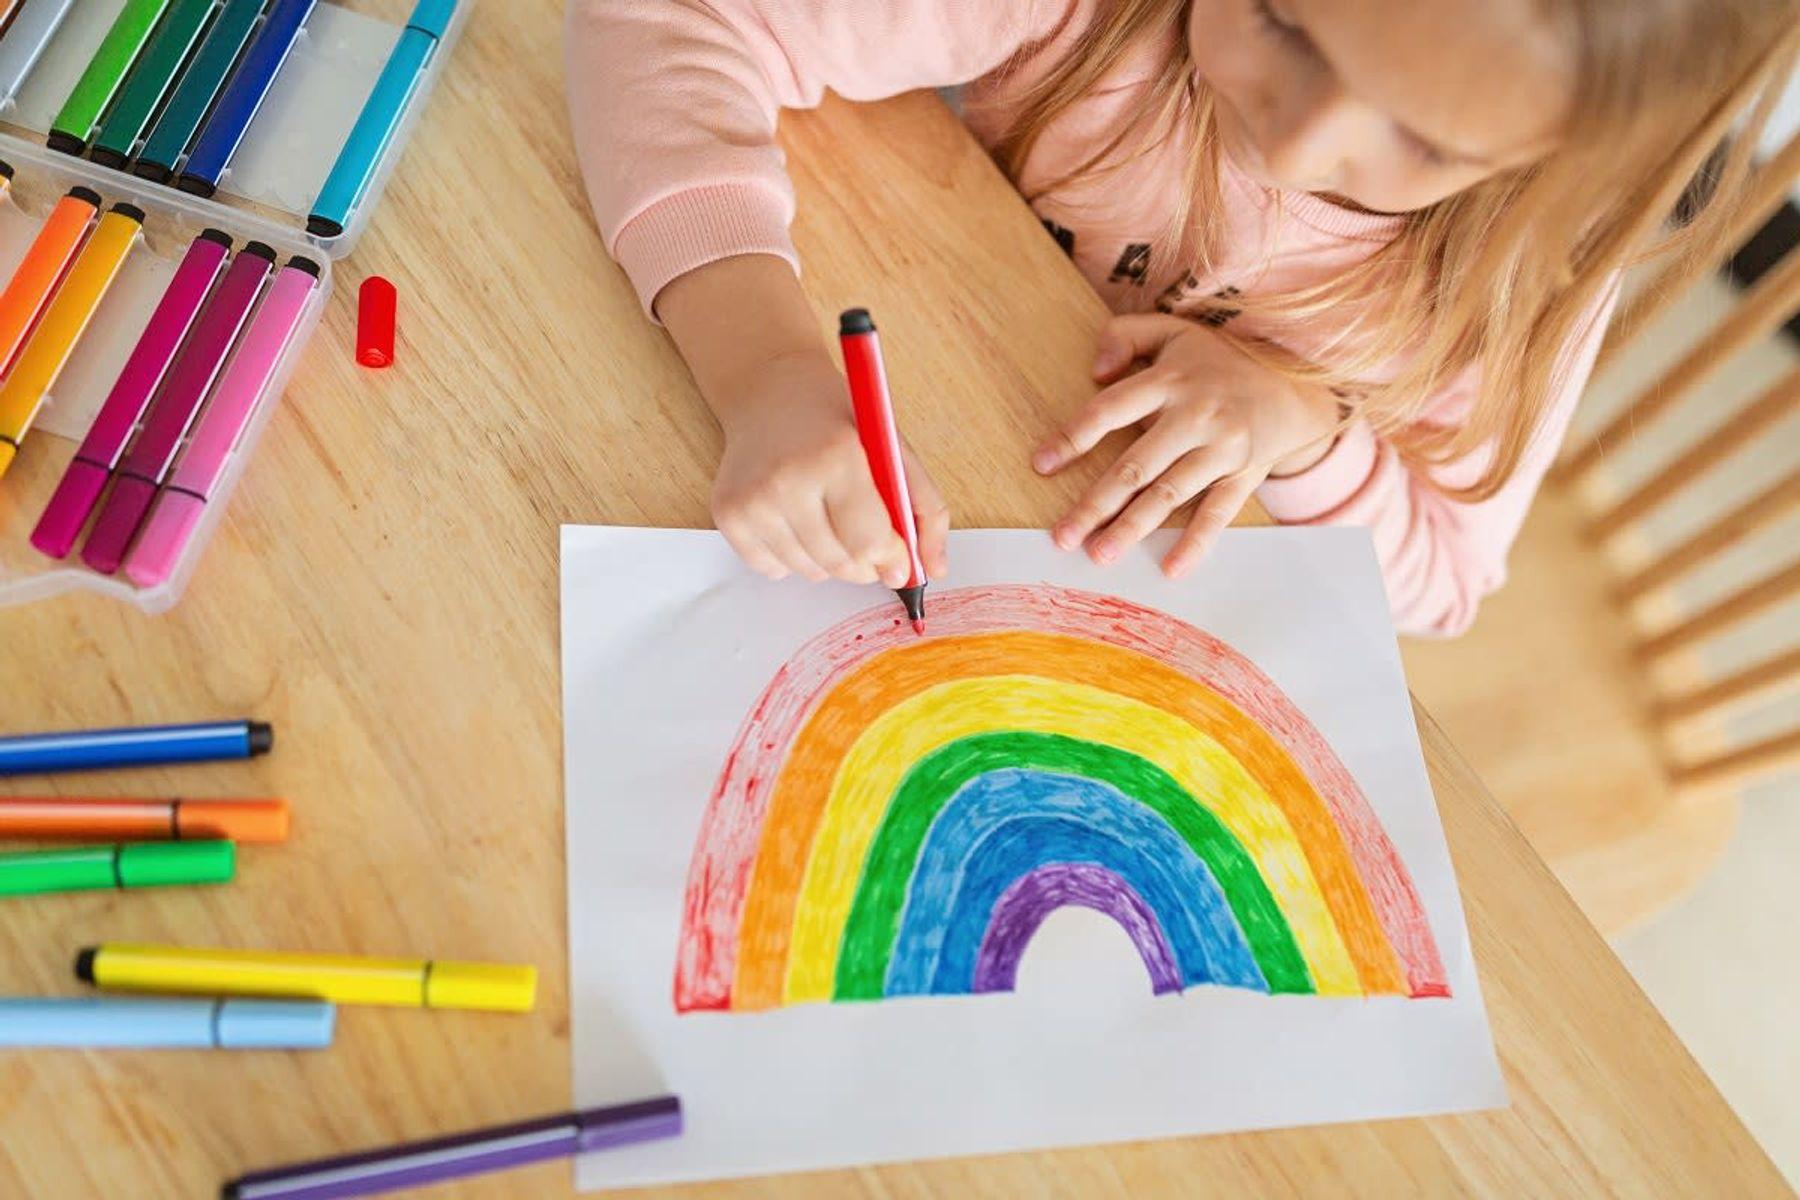 Masada Resim Yapan Küçük Kız Çocuğu